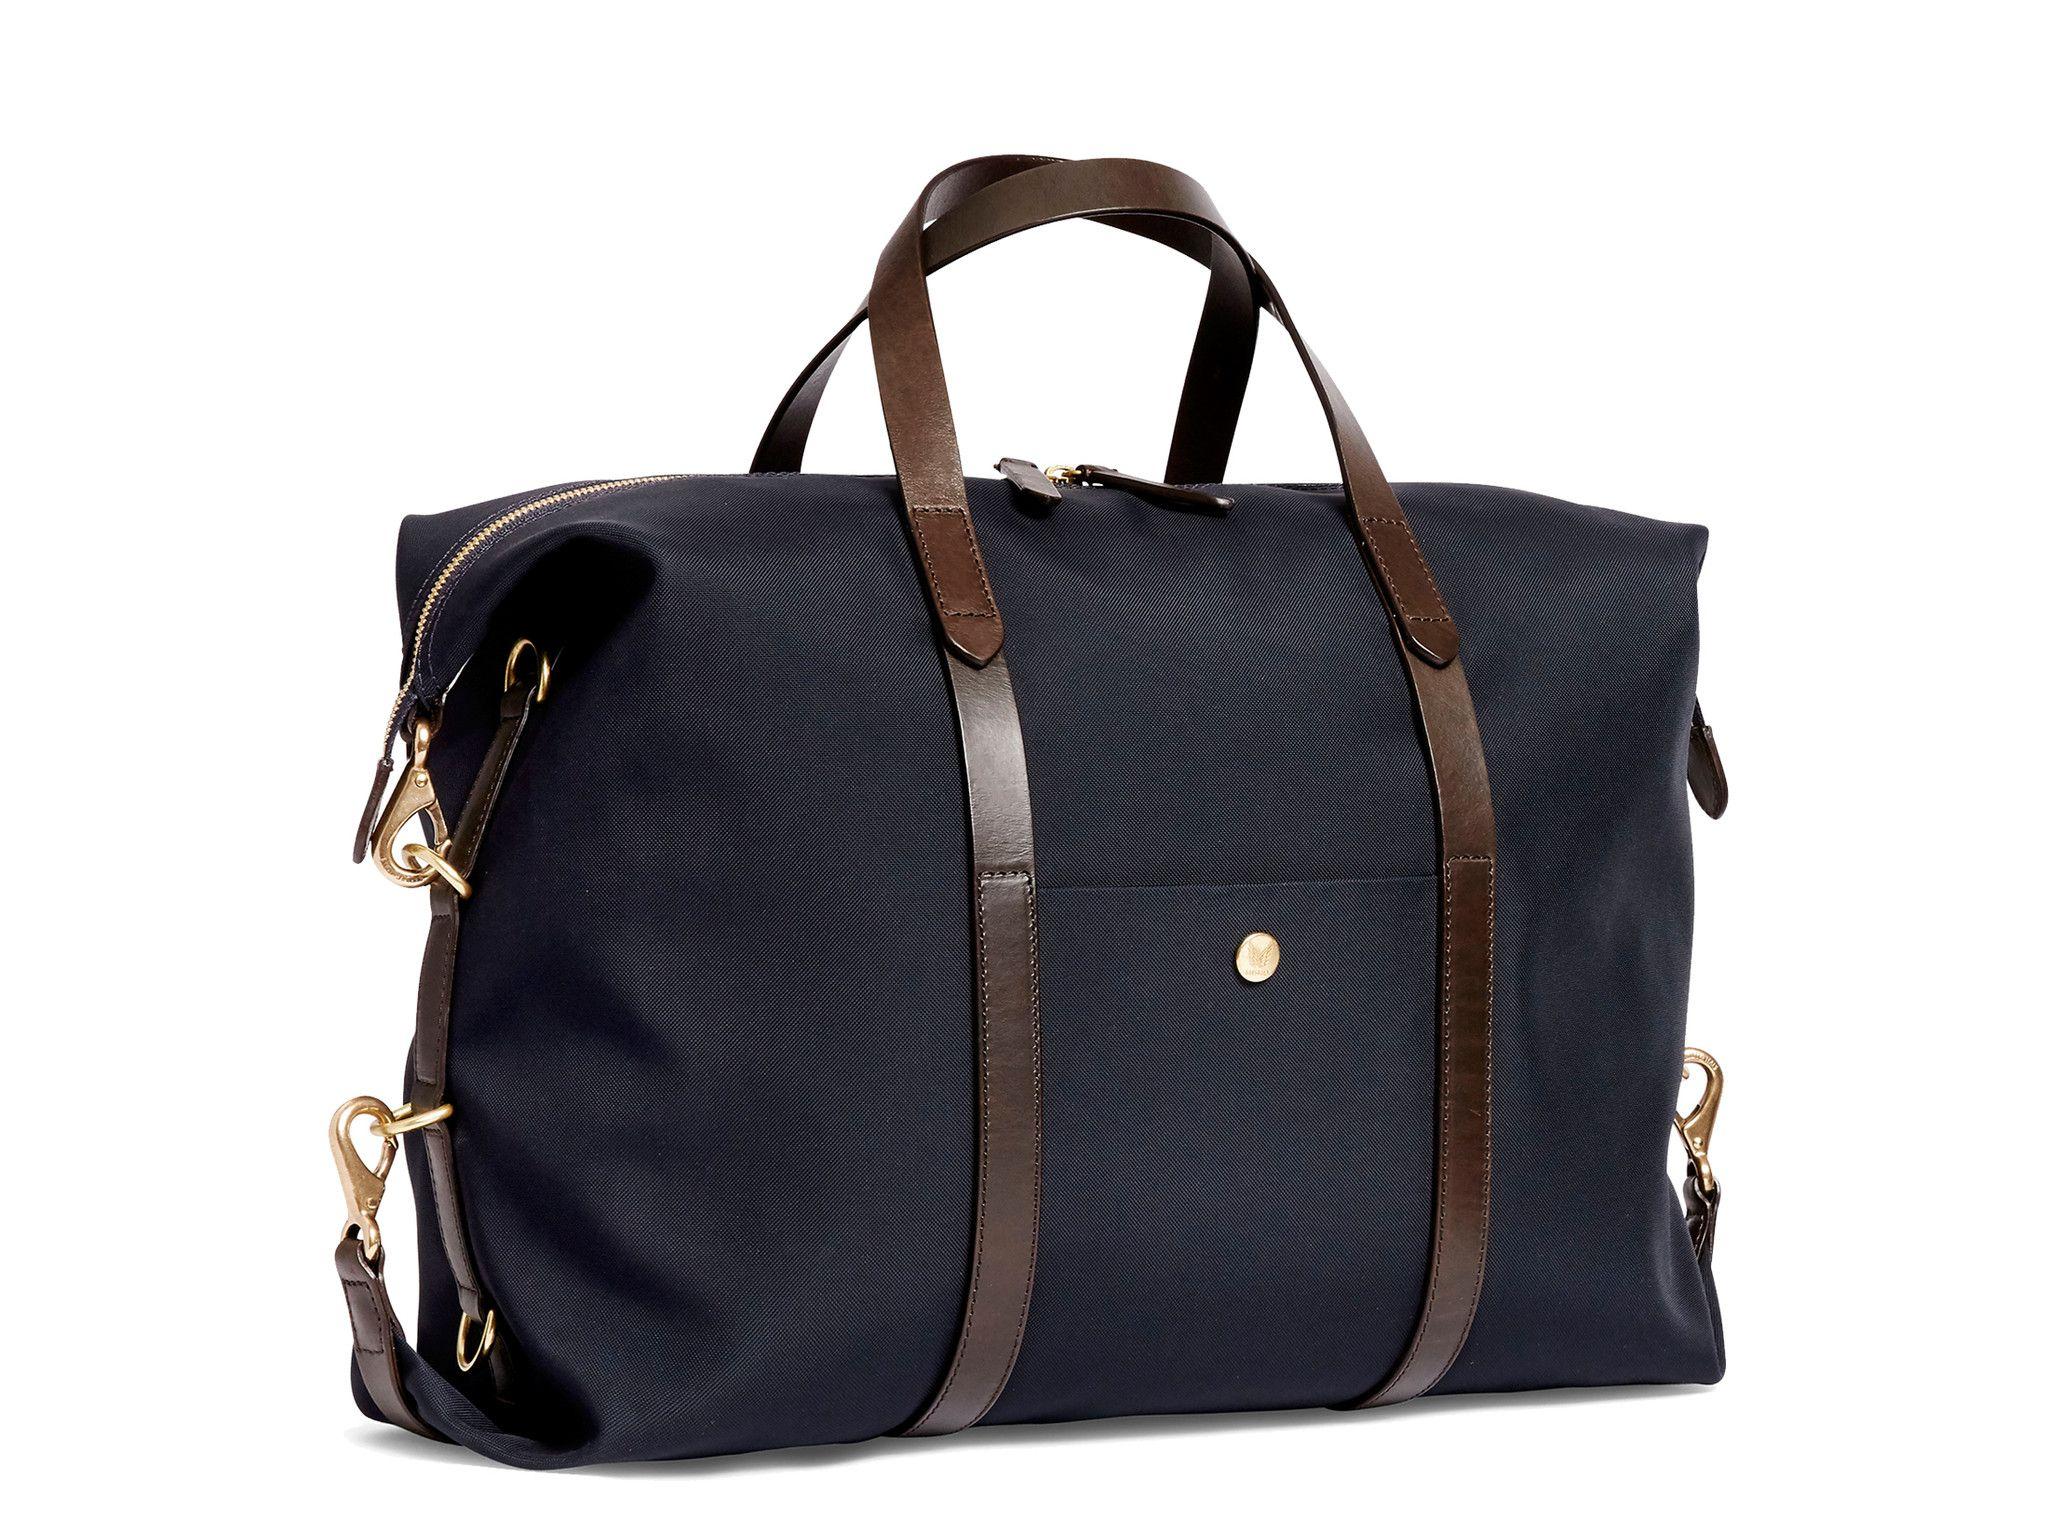 MISMO M/S Utility – Navy/Dark Brown - Tote bag - Mismo - 1 ...